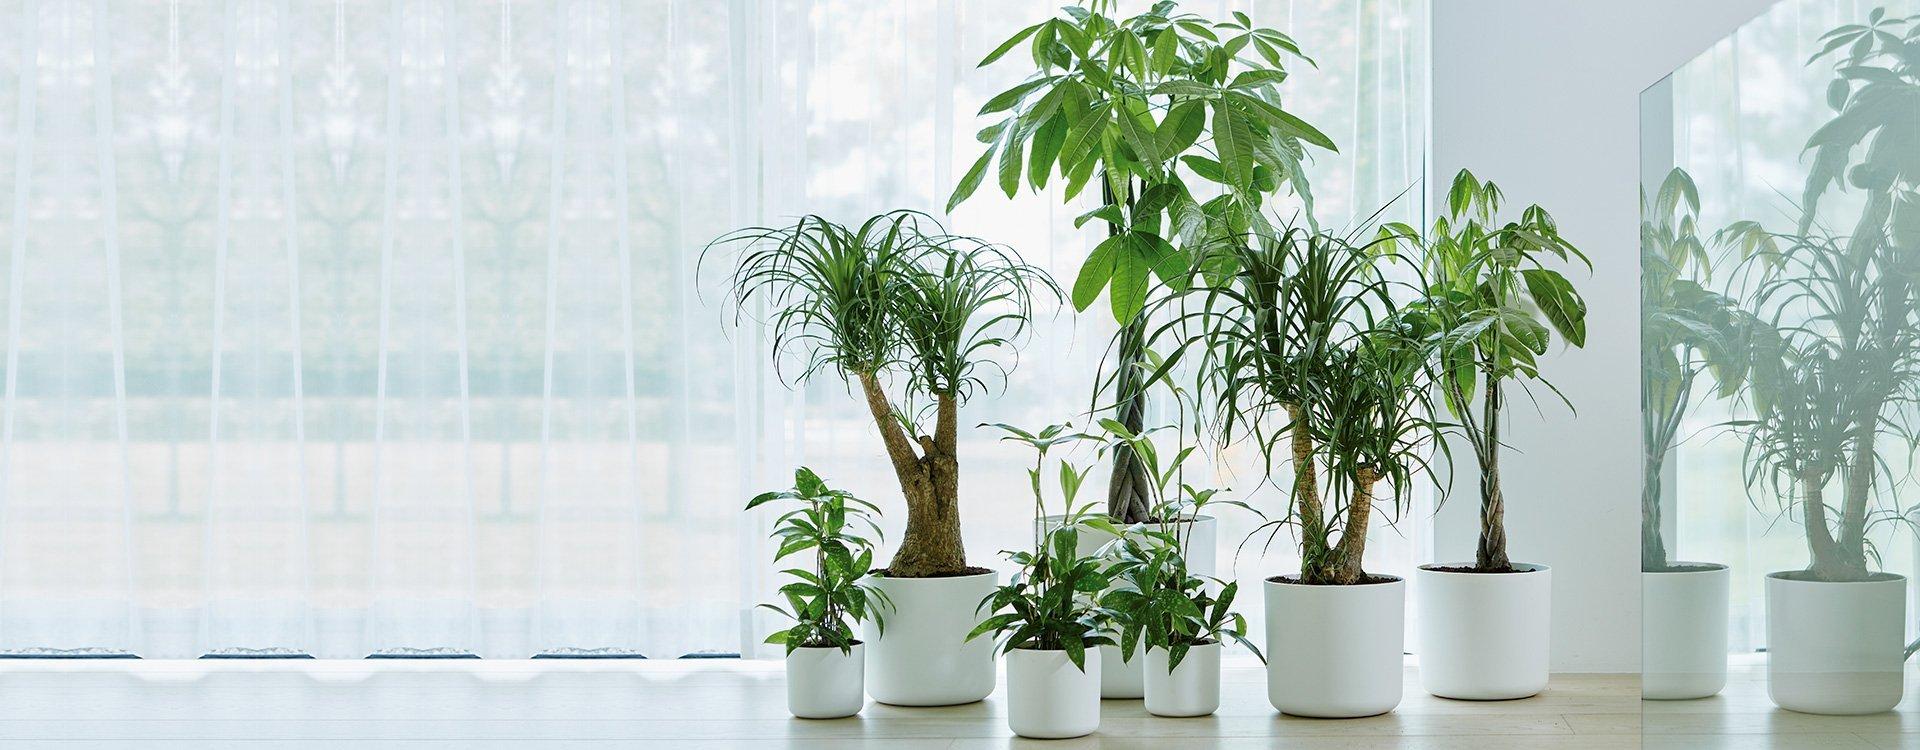 Venditapianteingrossoroma for Vendita piante ornamentali